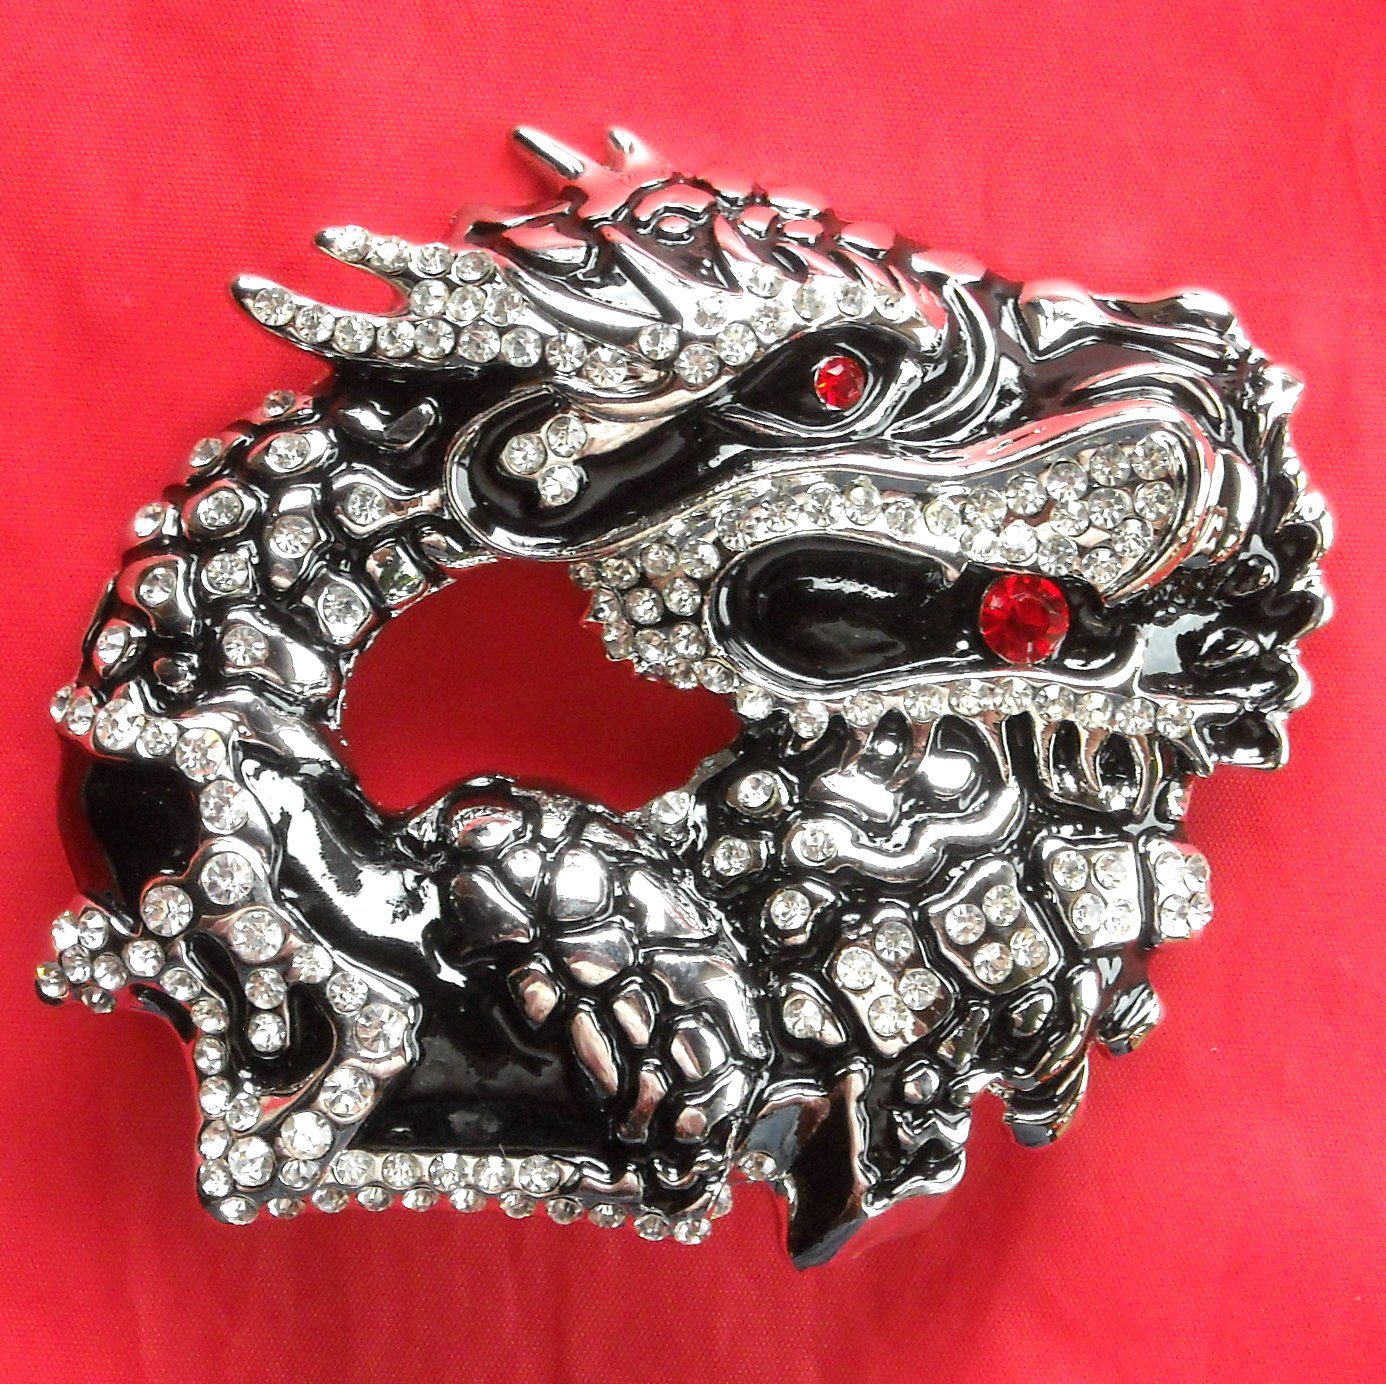 Big Chinese Dragon Rhinestone metal belt buckle